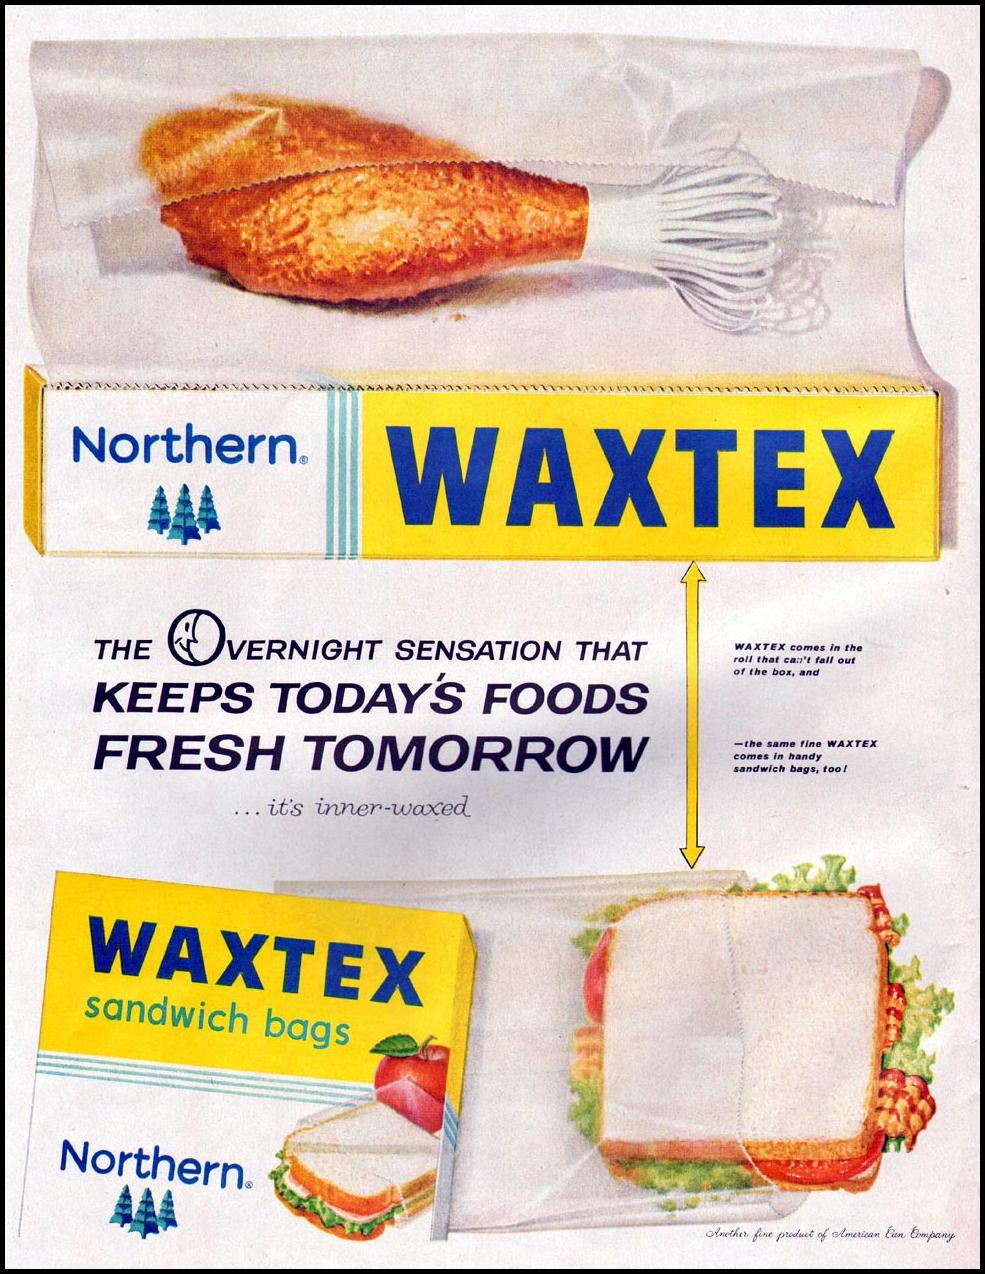 WAXTEX PLASTIC SANDWICH BAGS LIFE 10/05/1959